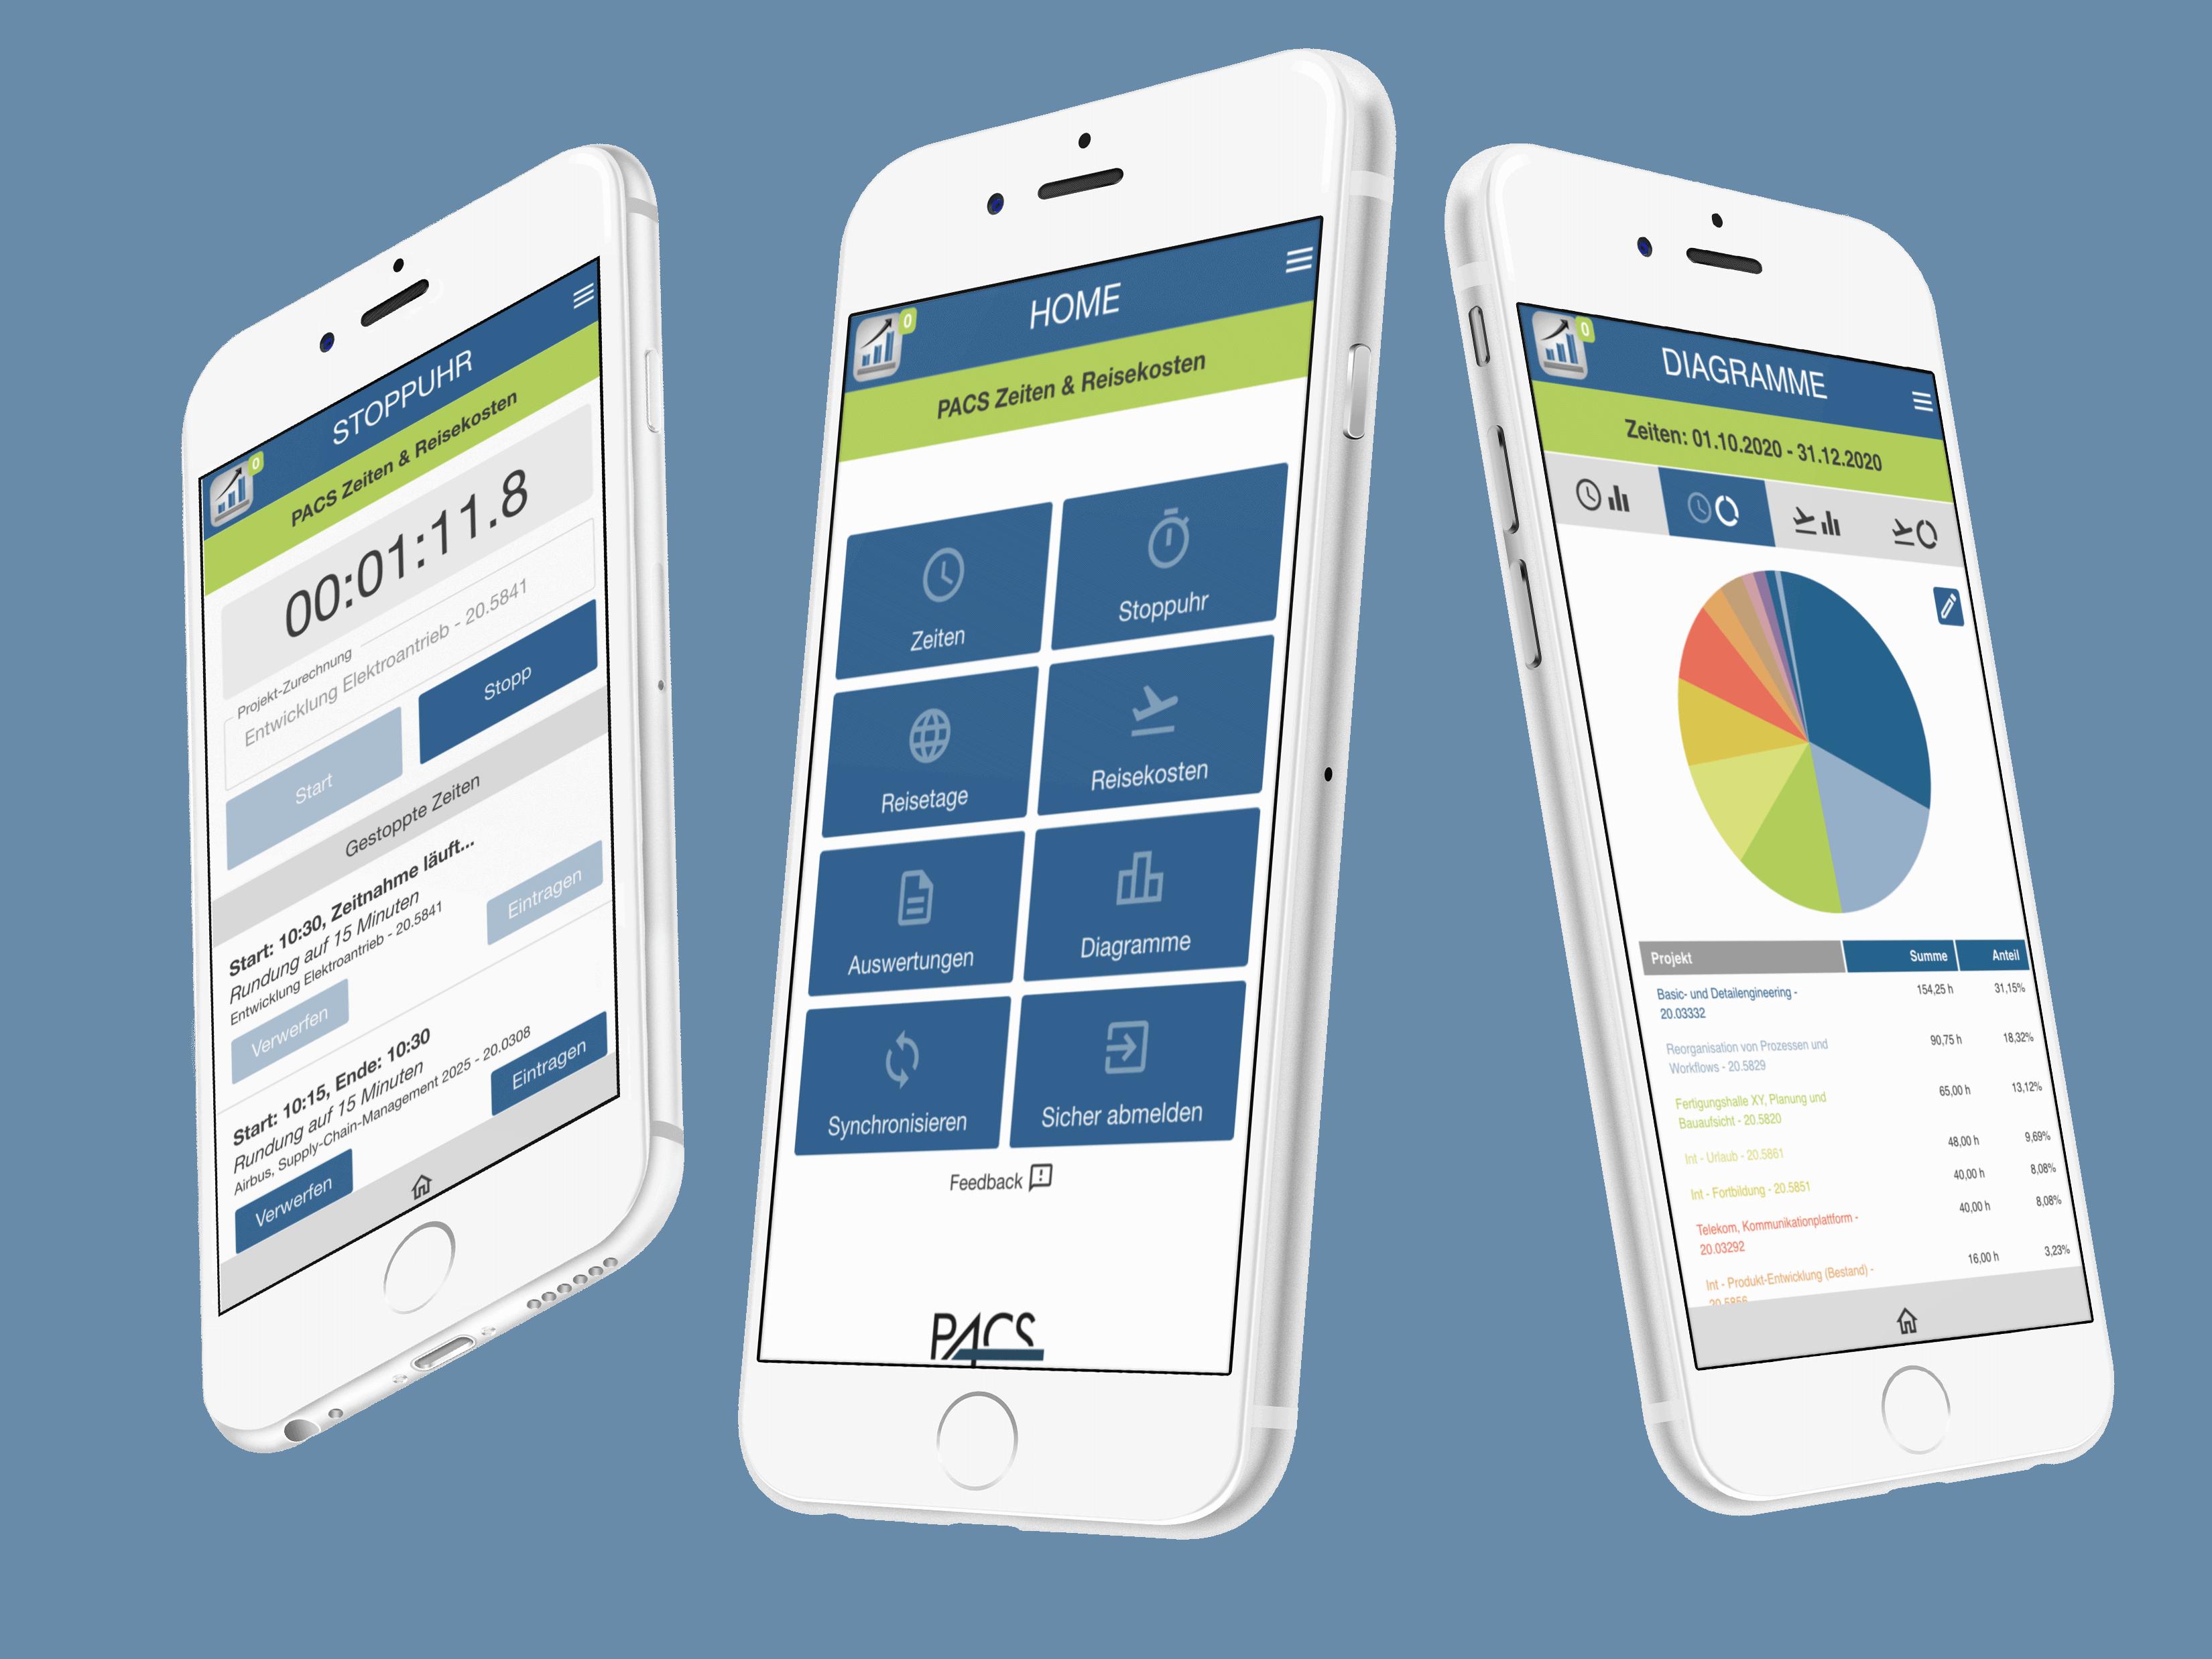 PACS Mobile App